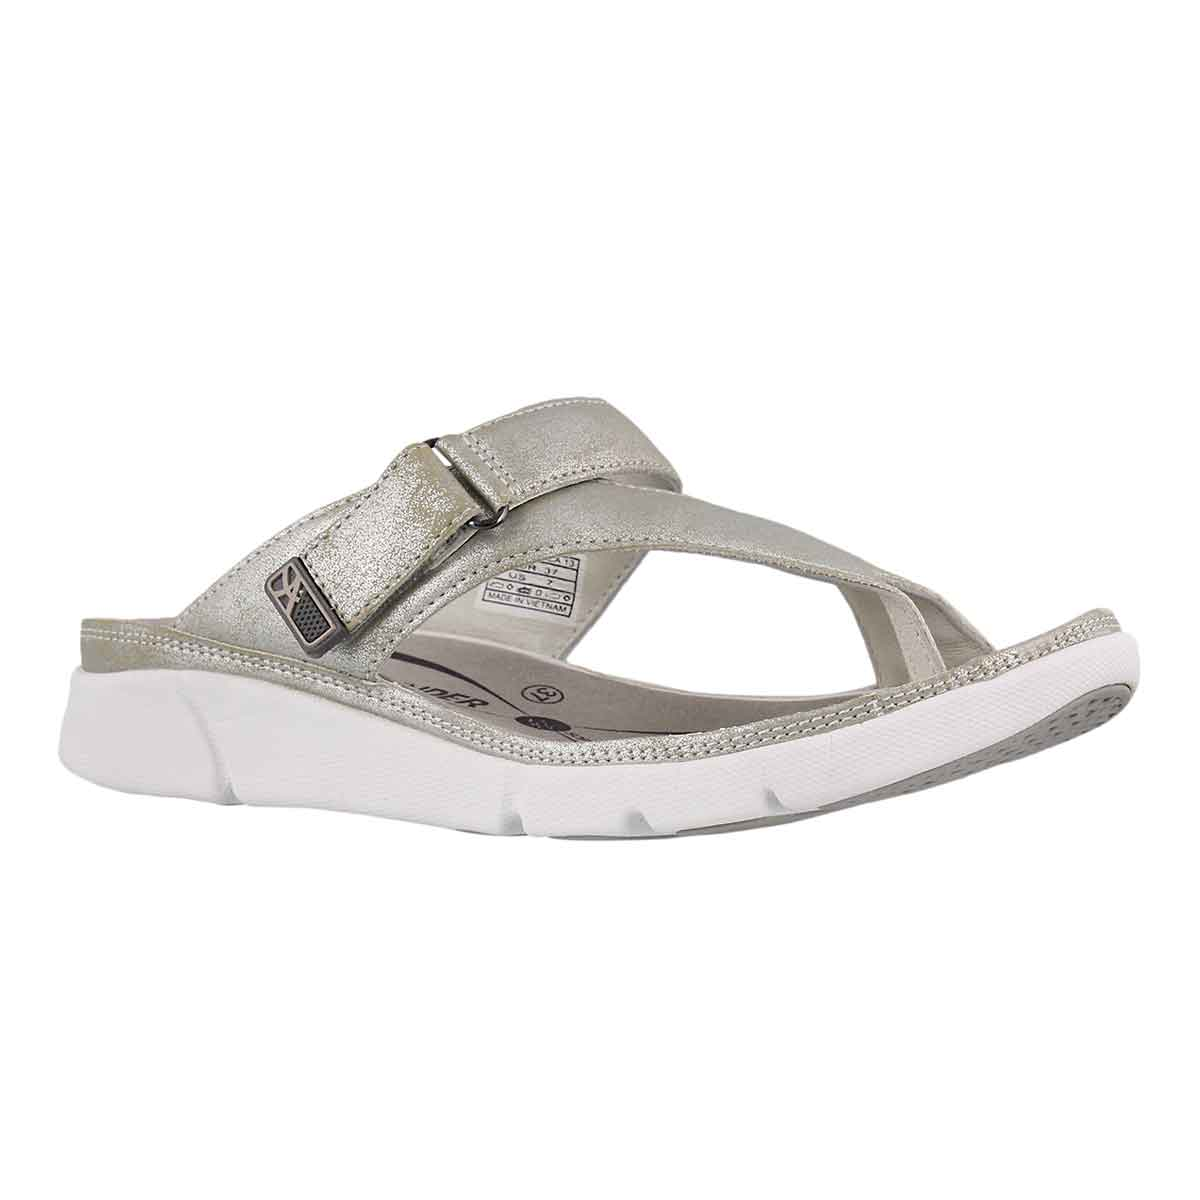 Women's TOKARA silver thong sandals